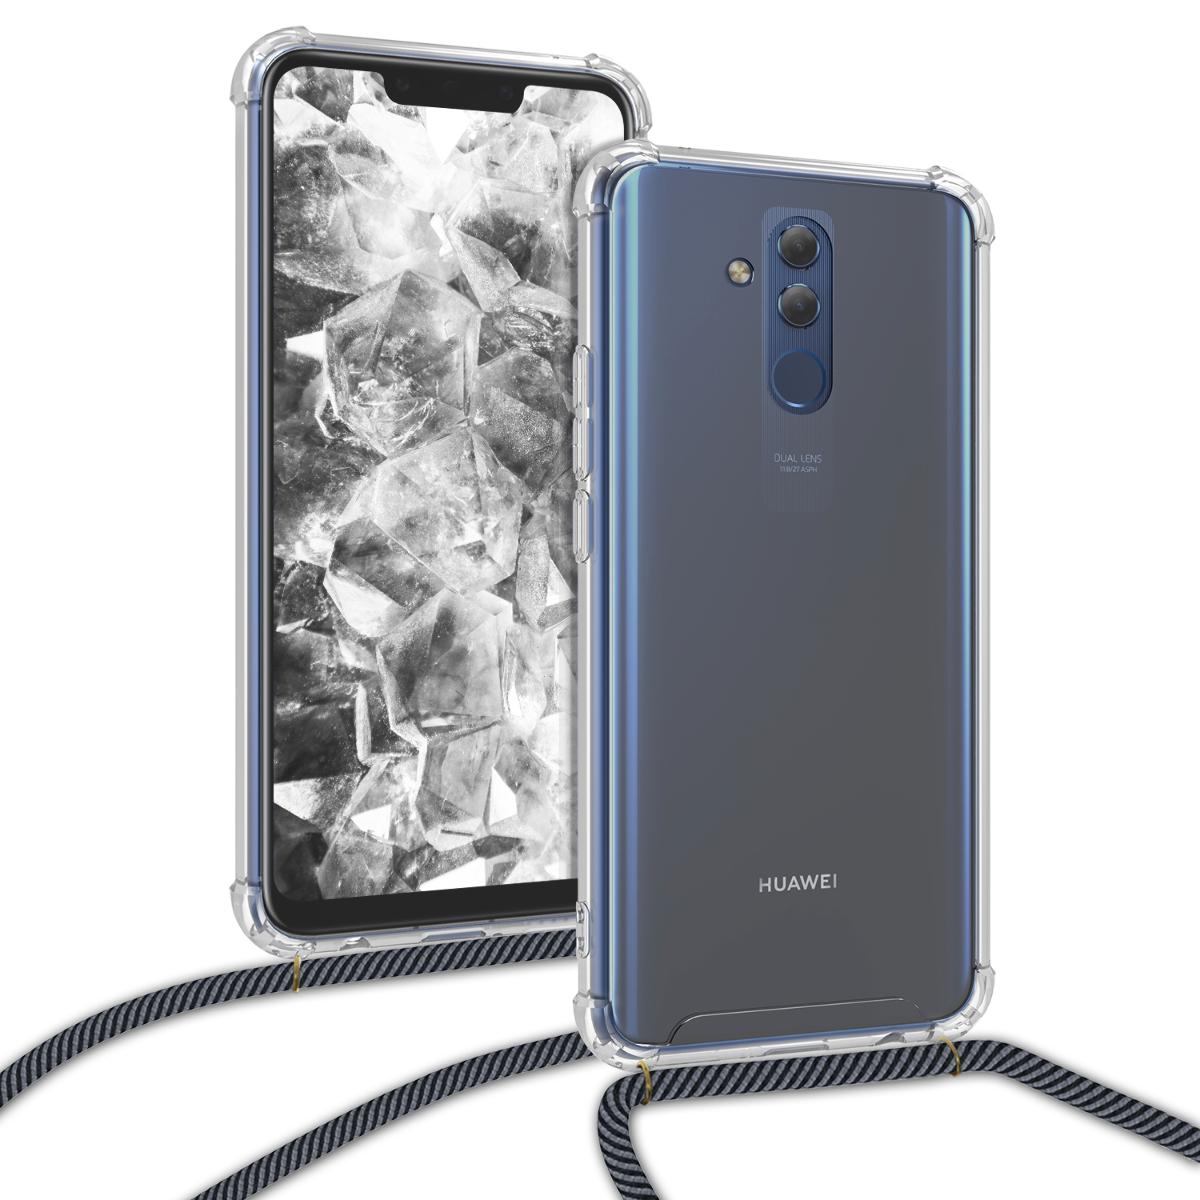 KW Θήκη Σιλικόνης με Λουράκι Λαιμού Huawei Mate 20 Lite - Transparent (47168.73)